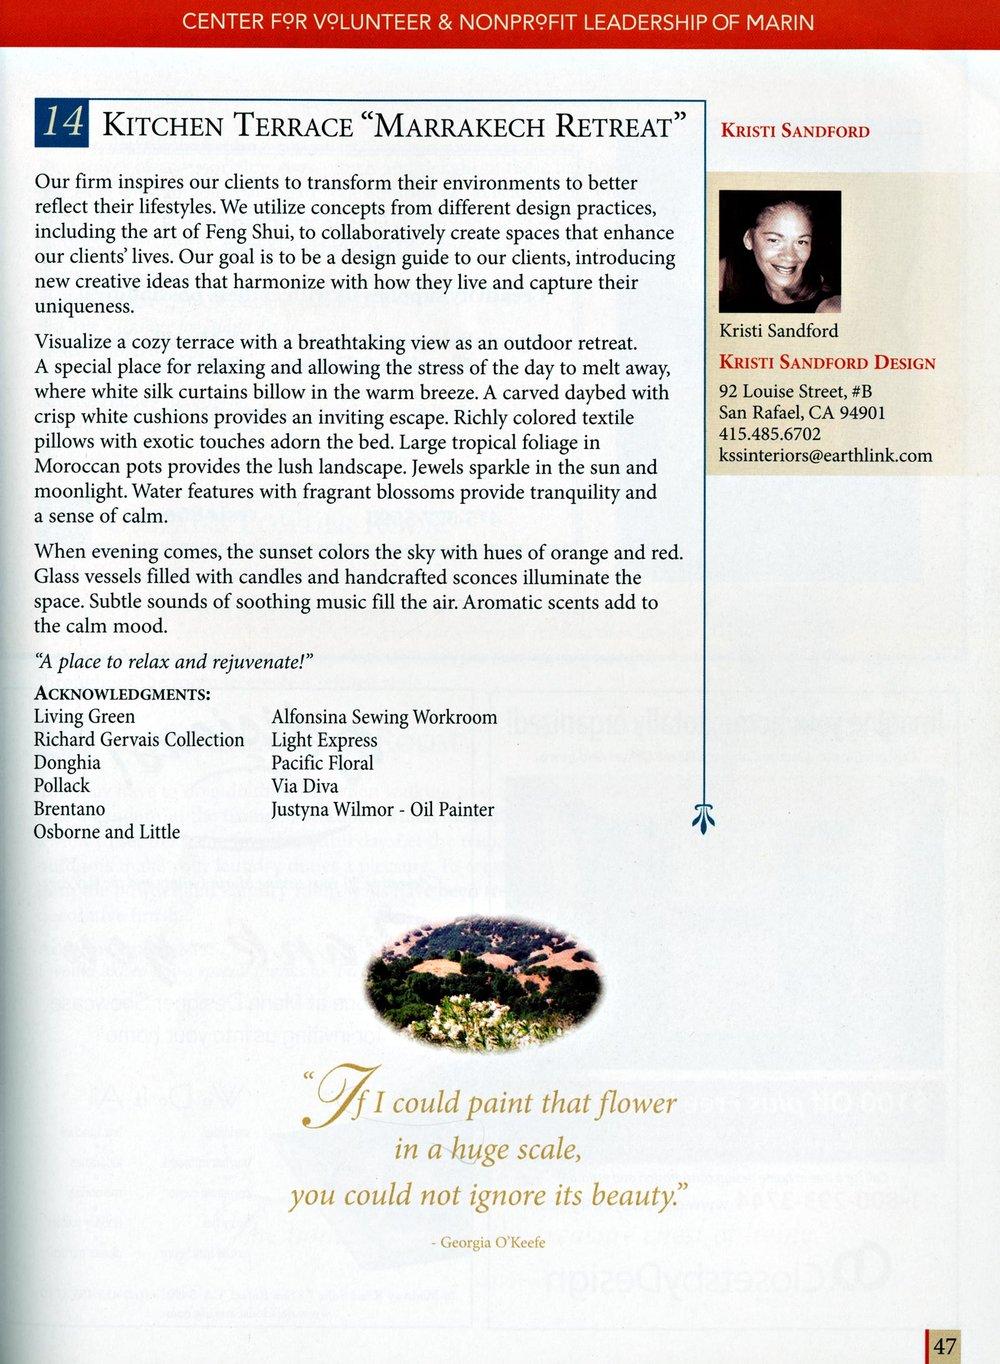 marin-designers-showcase-2005-2.jpg